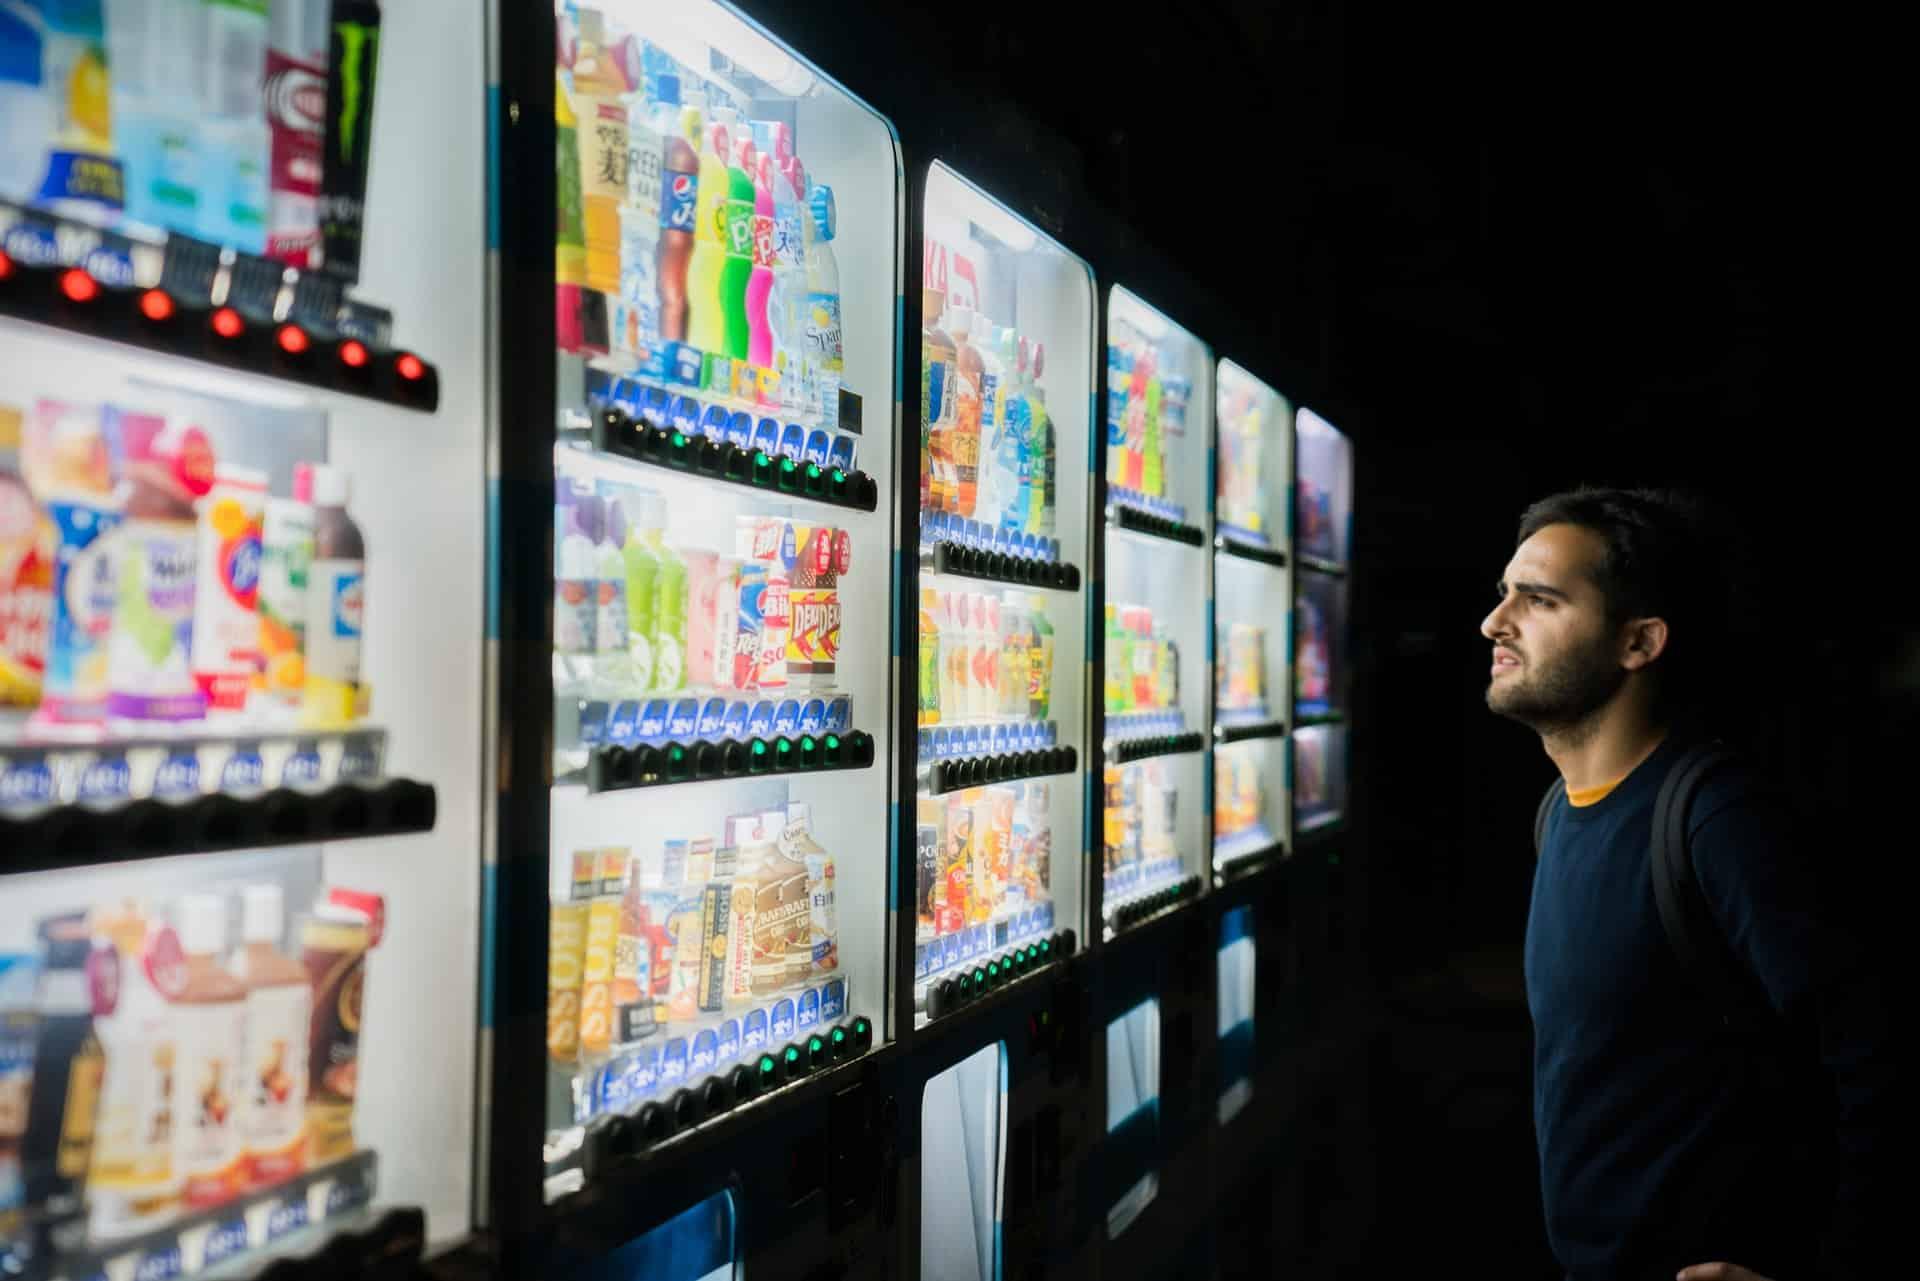 Digital Vending Machine Technology Era Header Image